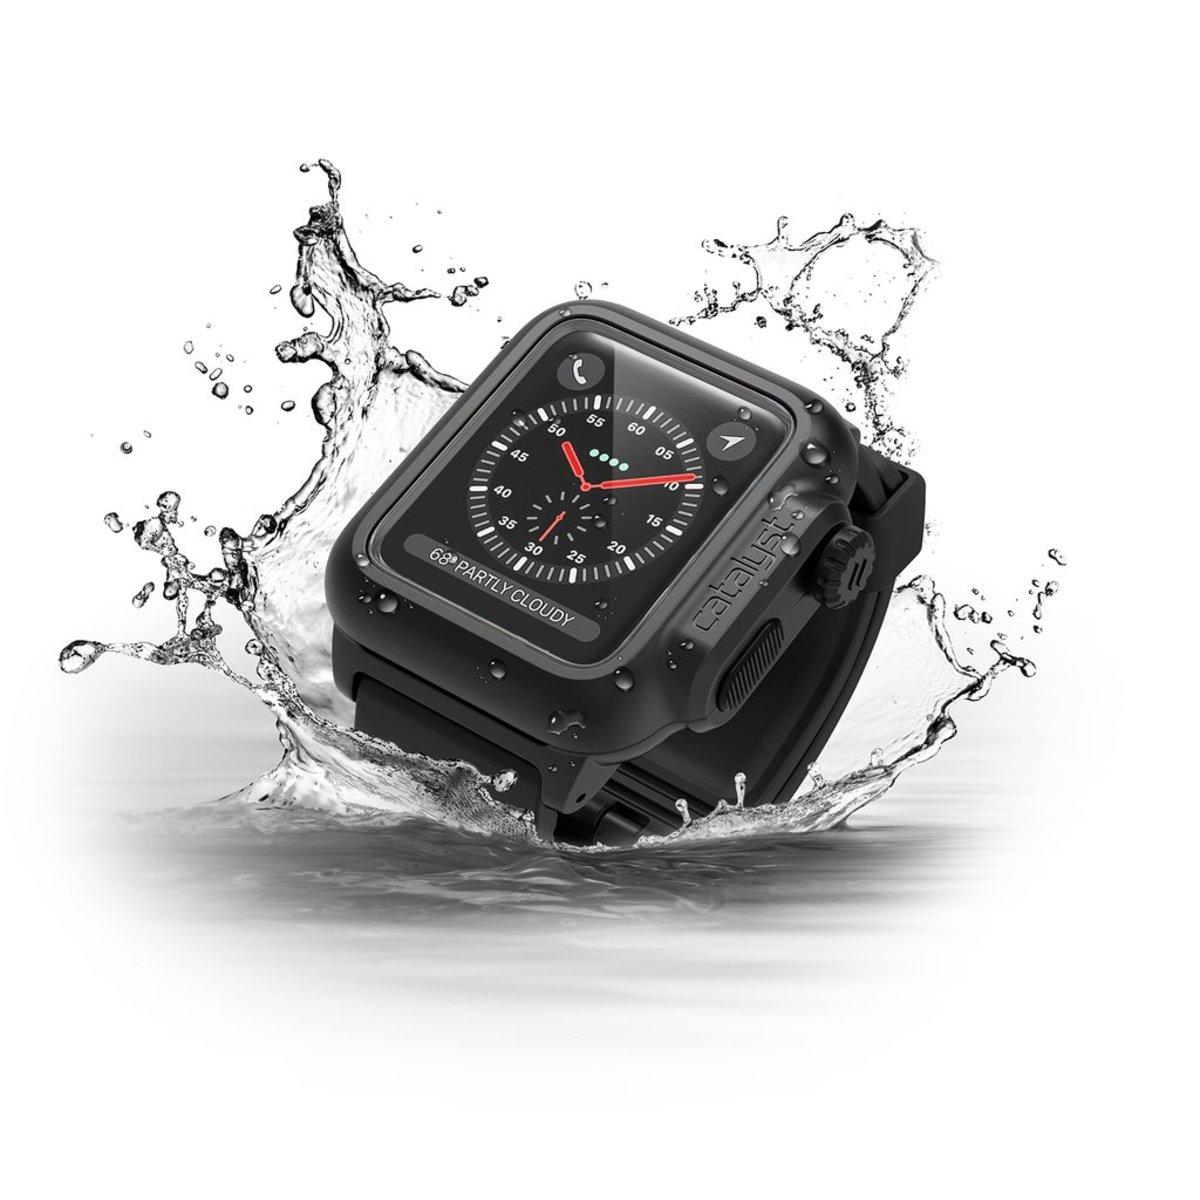 Catalyst® Waterproof Case for 42mm Apple Watch Series 2/ 3 - Stealth Black